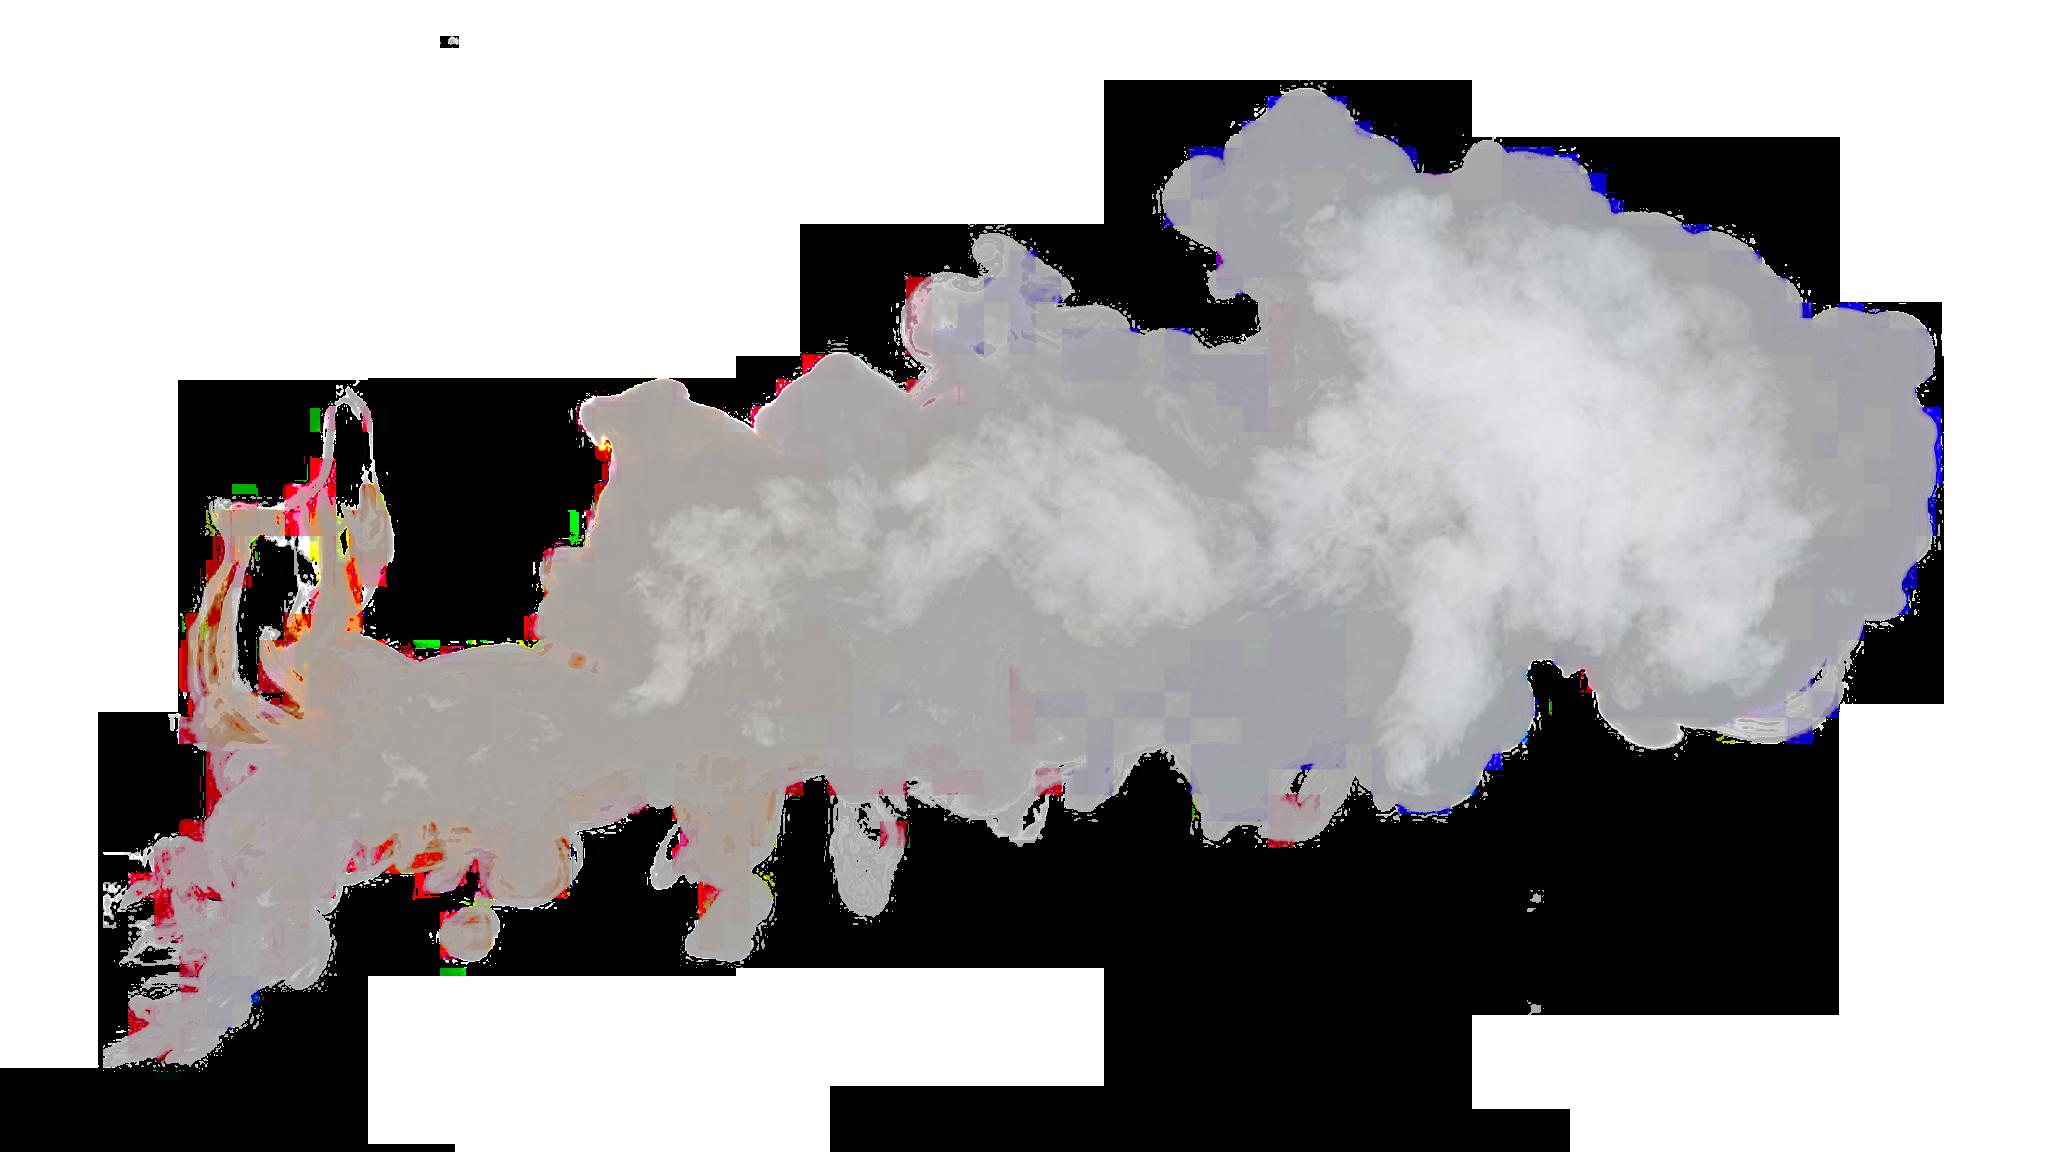 Color Palette For Website Smoke Png Image Purepng Free Transparent Cc0 Png Image